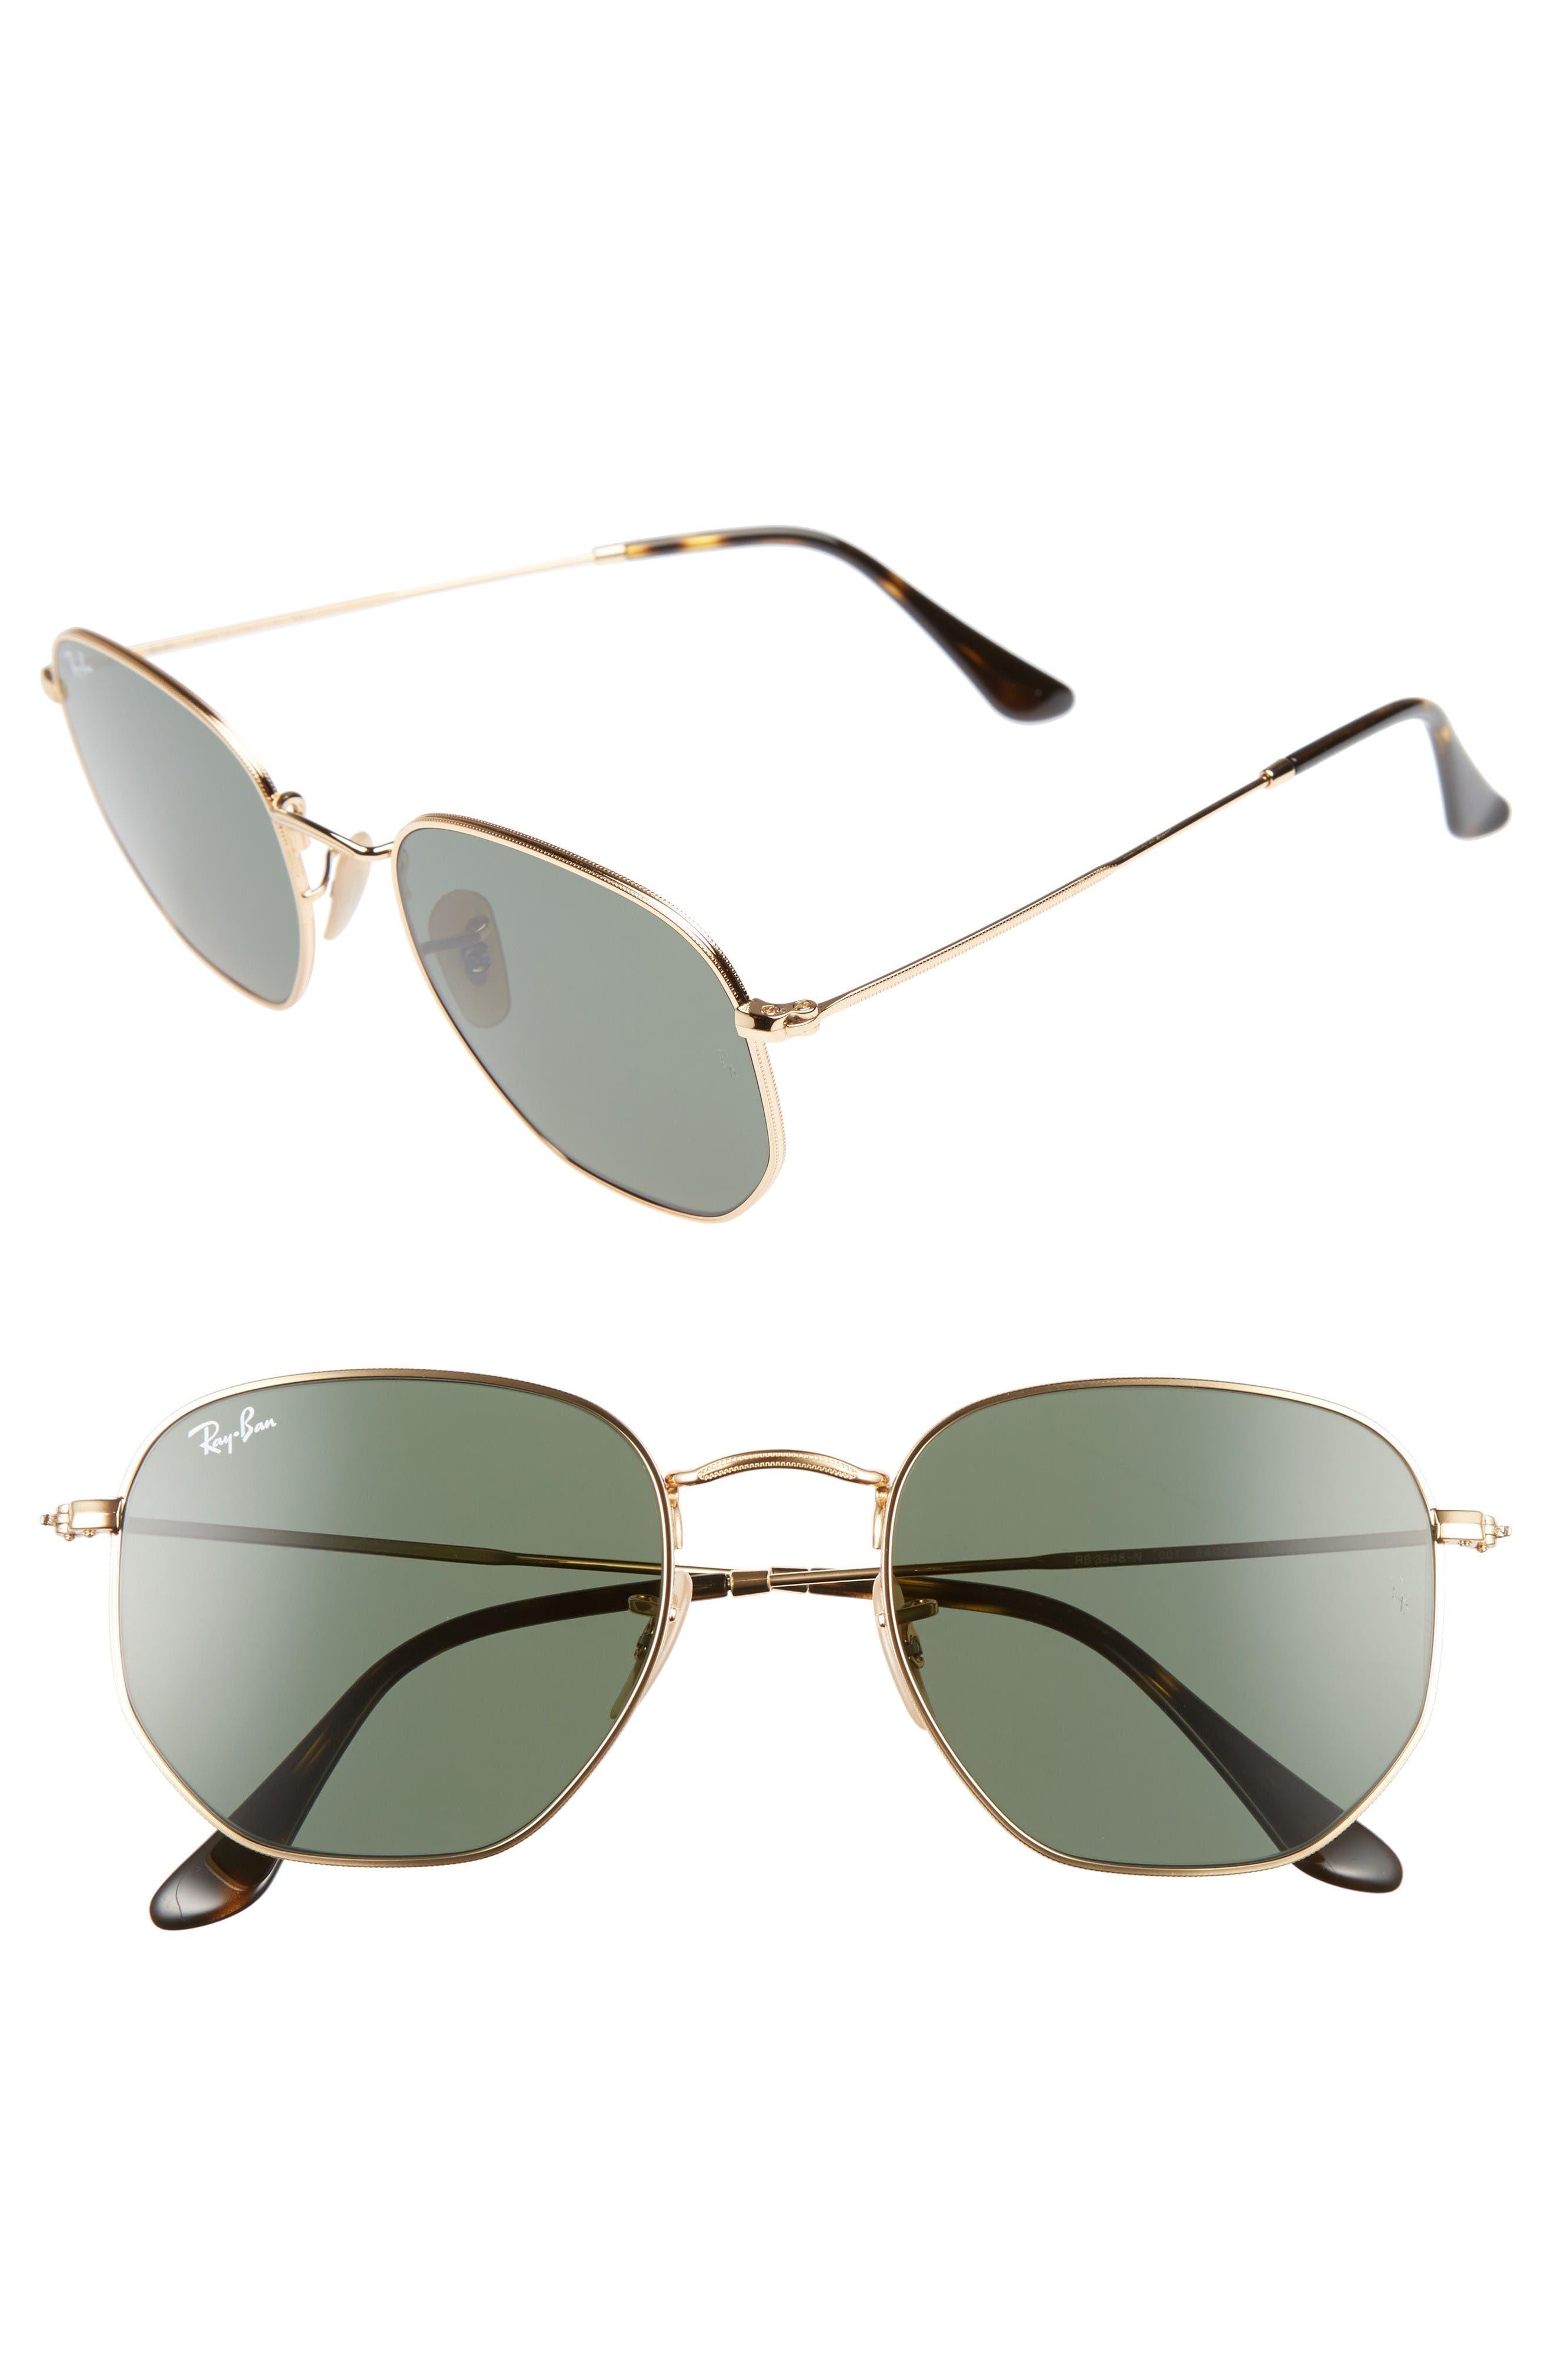 54mm Aviator Sunglasses,                         Main,                         color, Gold/ Green